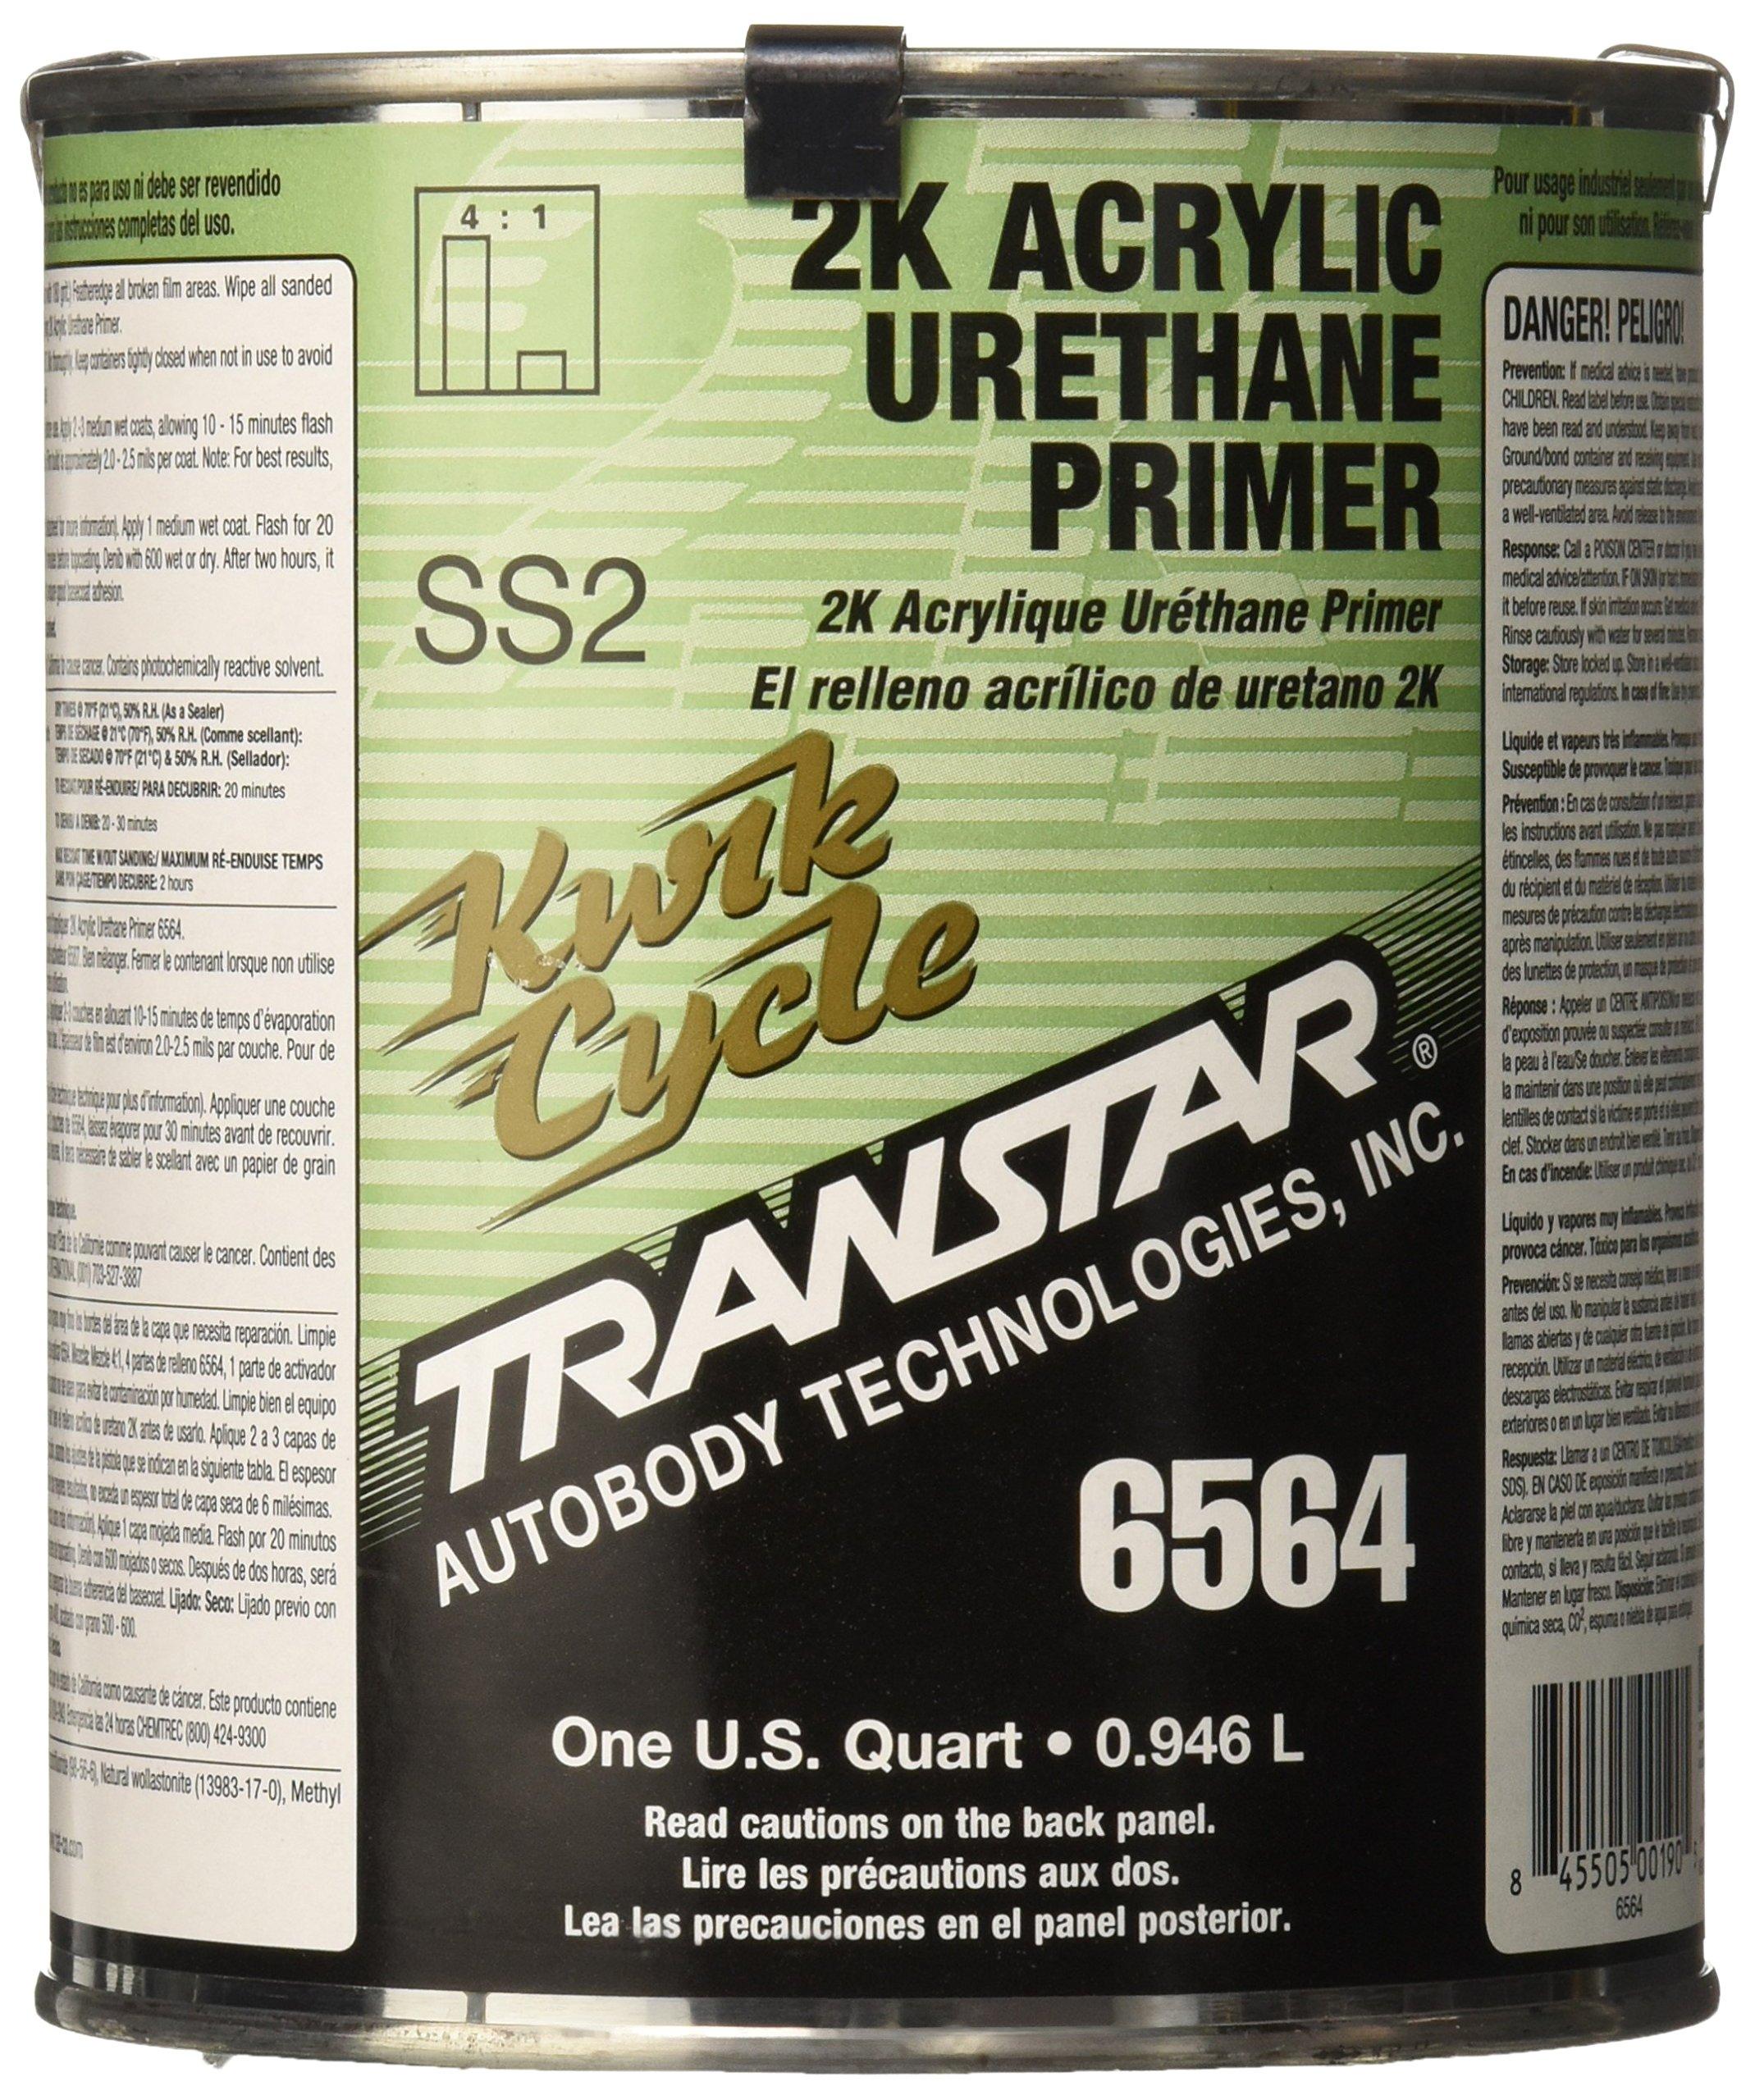 TRANSTAR (6564) 2K Urethane Primer - 1 Quart